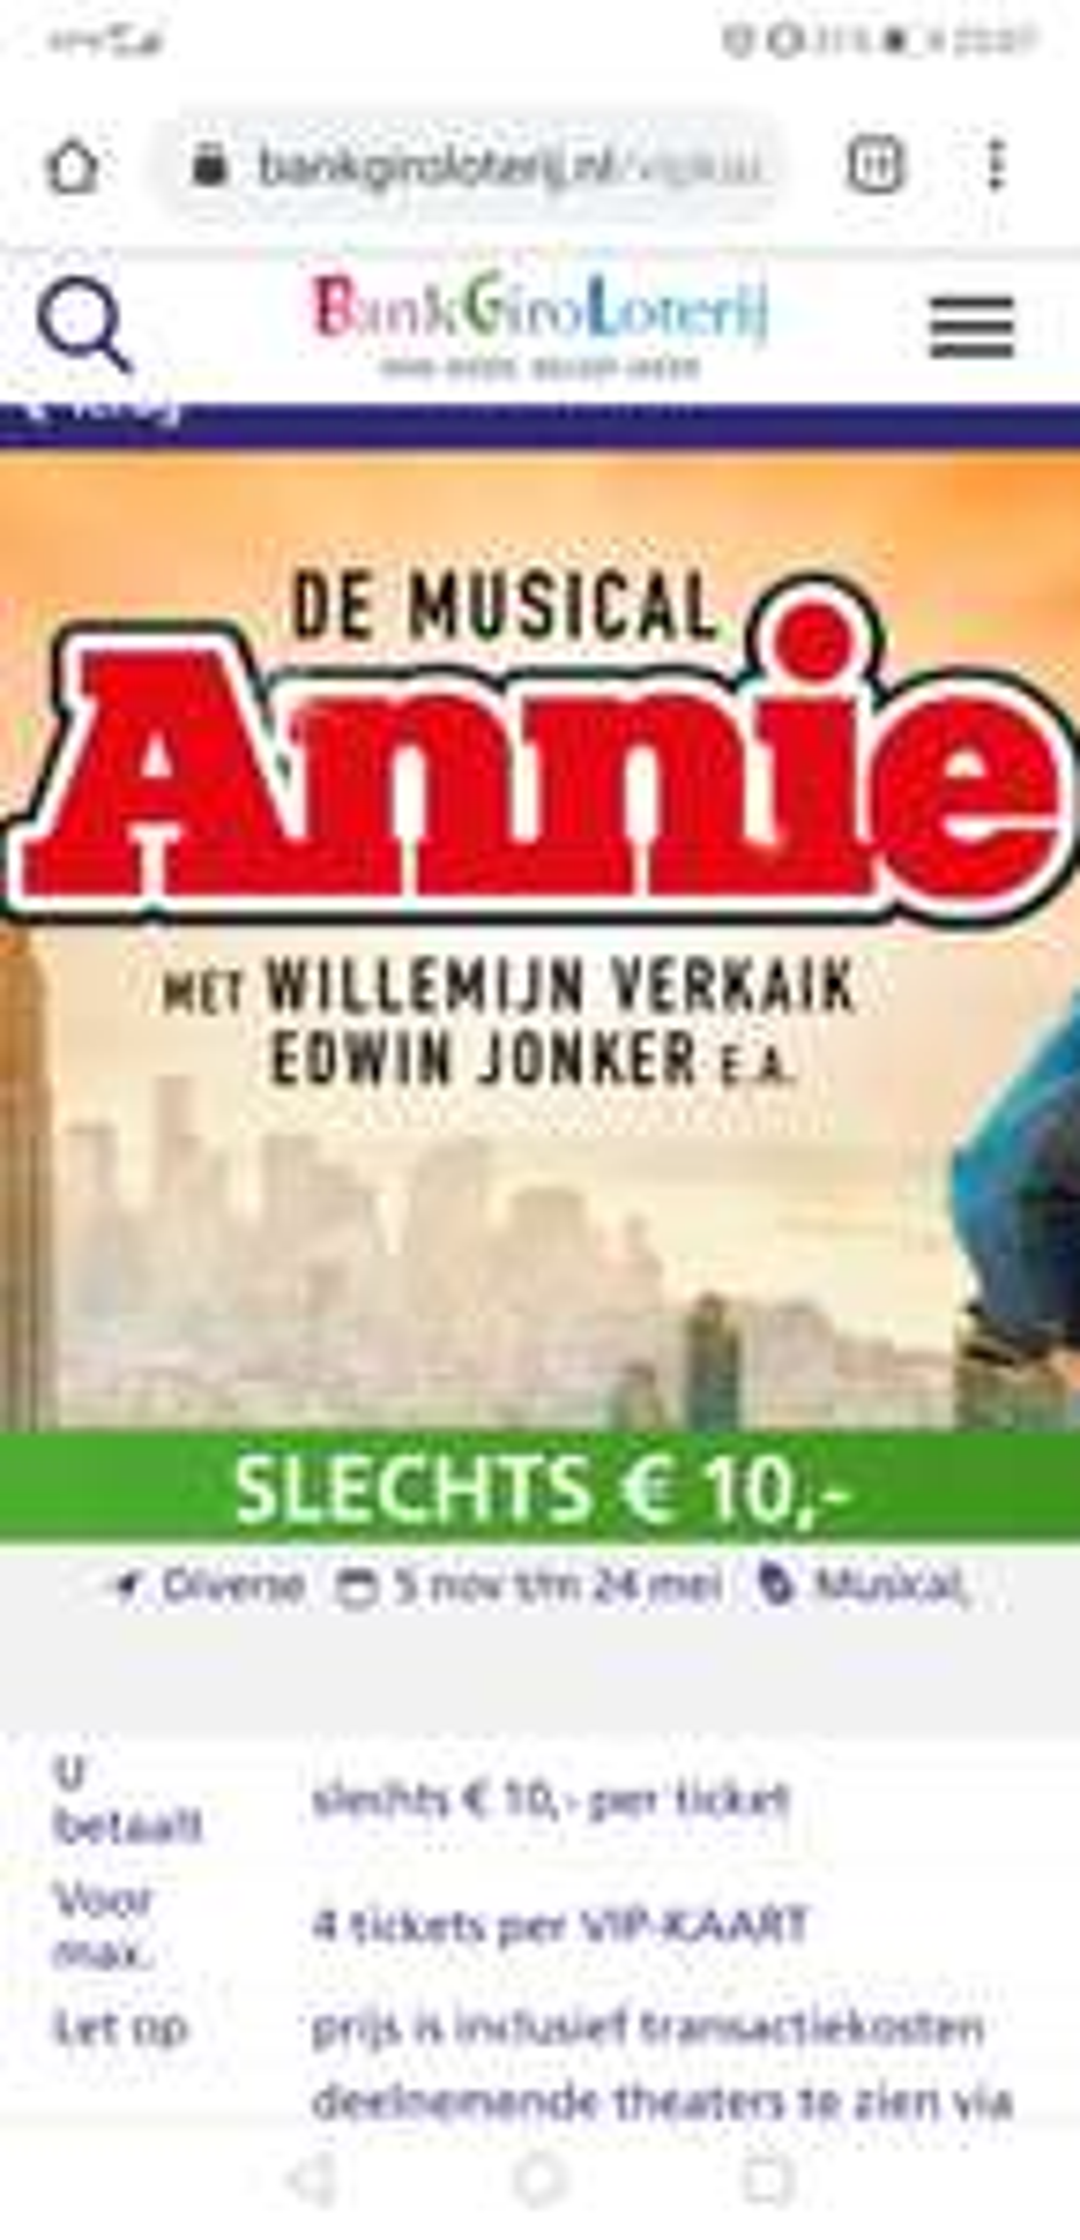 1E RANG kaartjes voor musical 'Annie' met bankgiro loterij VIP kaart